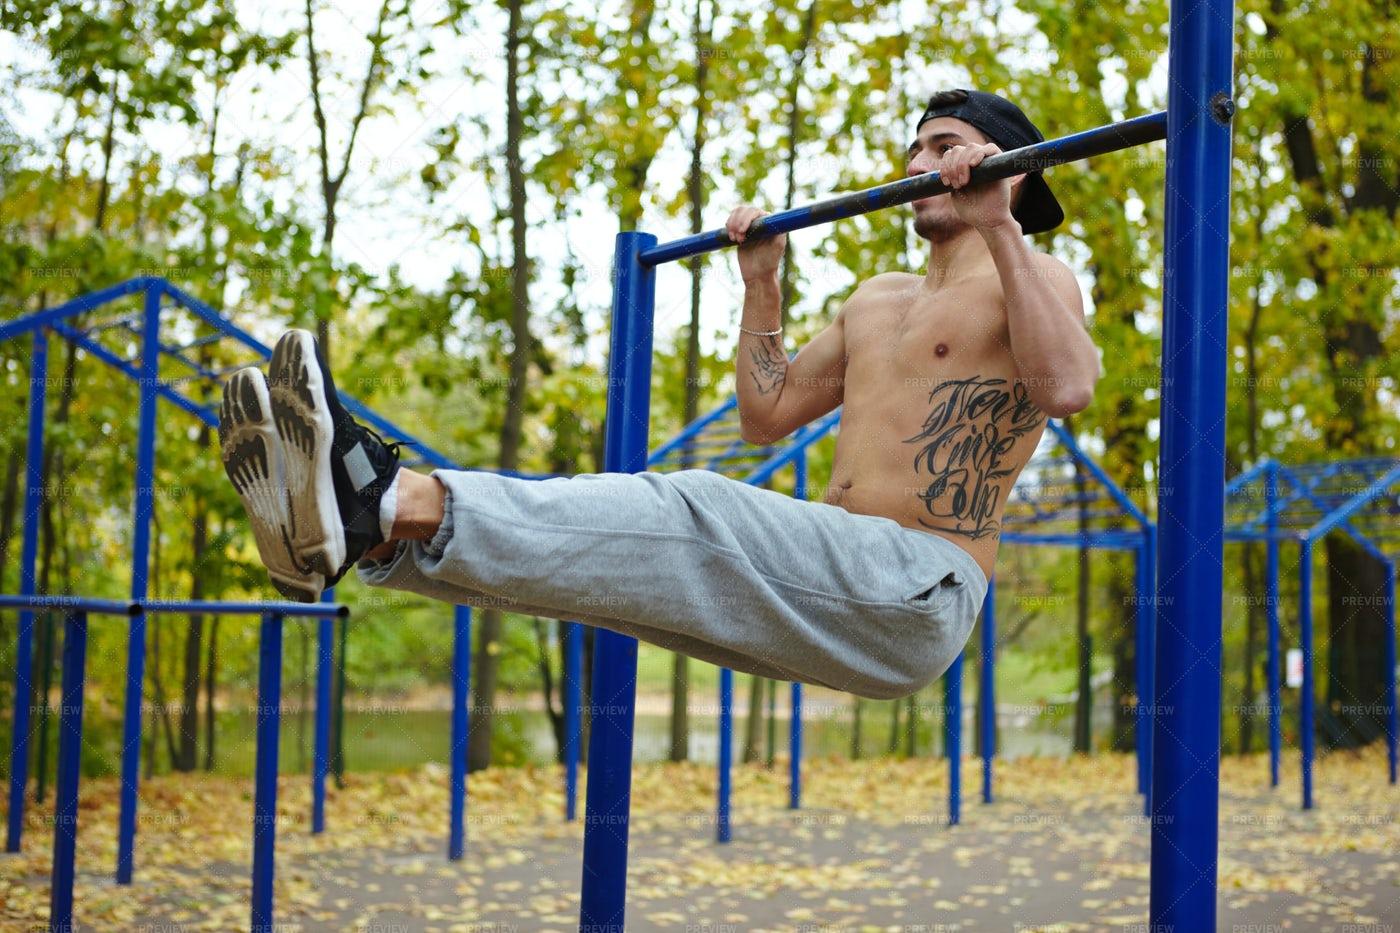 Exercising Abdominal Muscles On Bar: Stock Photos